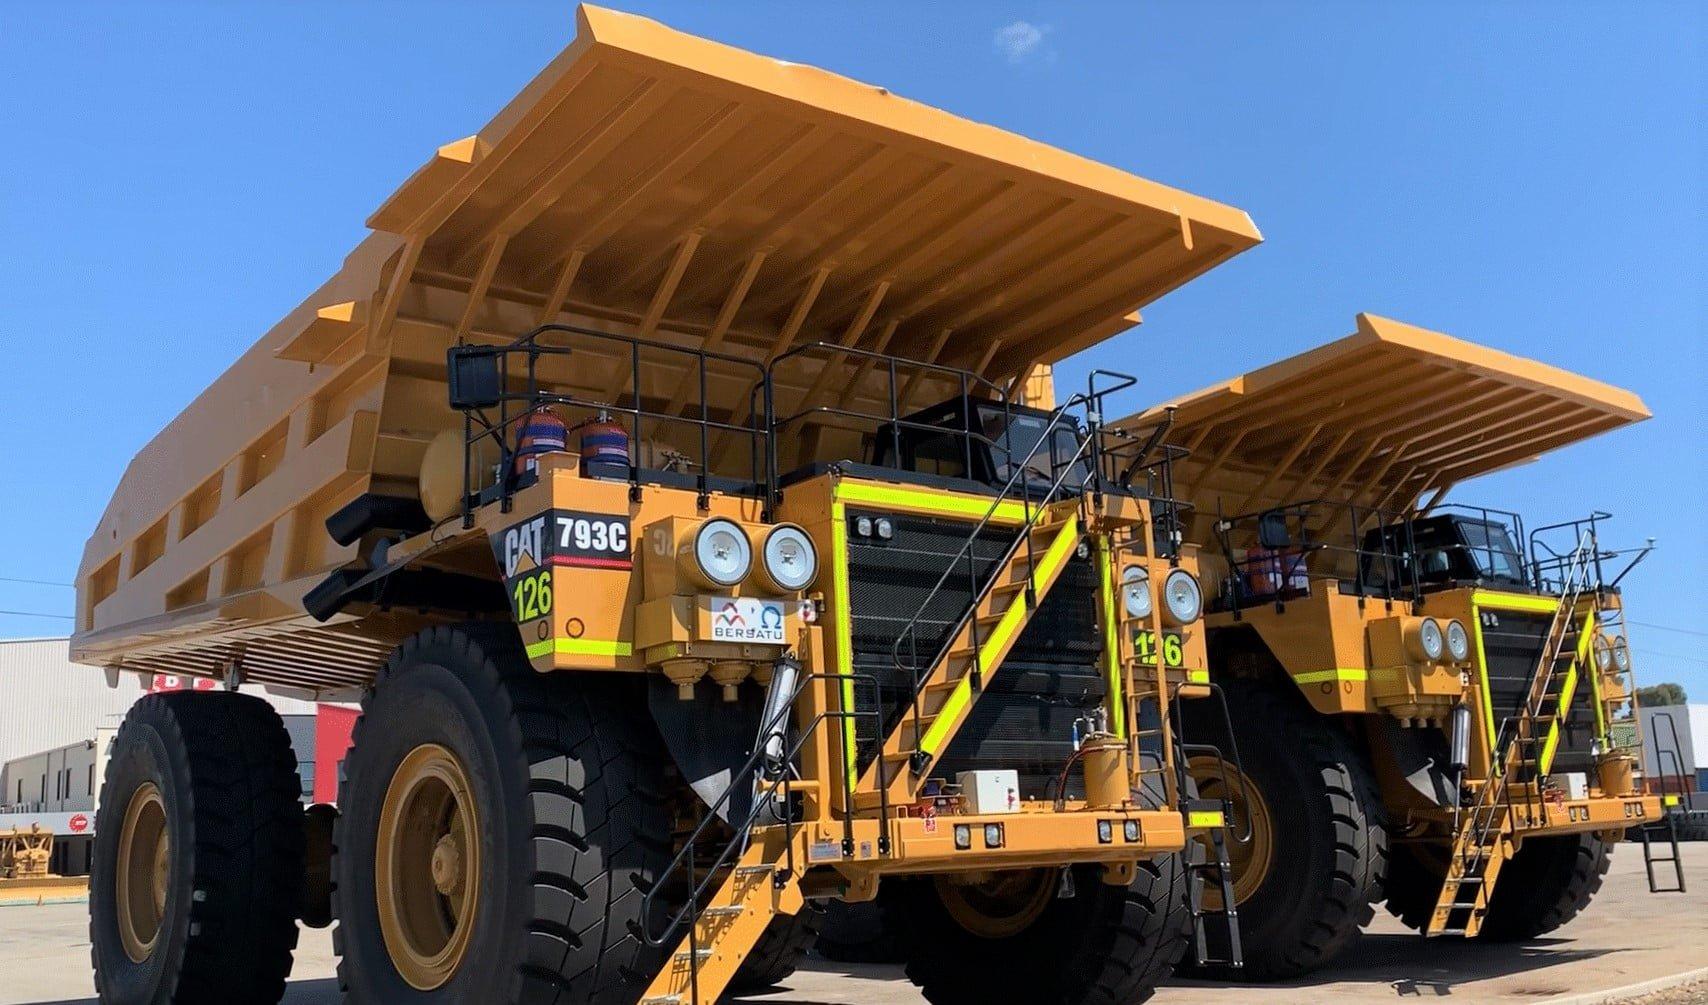 CAT 793c Truck Rebuilds Photo Gallery • Trays 1